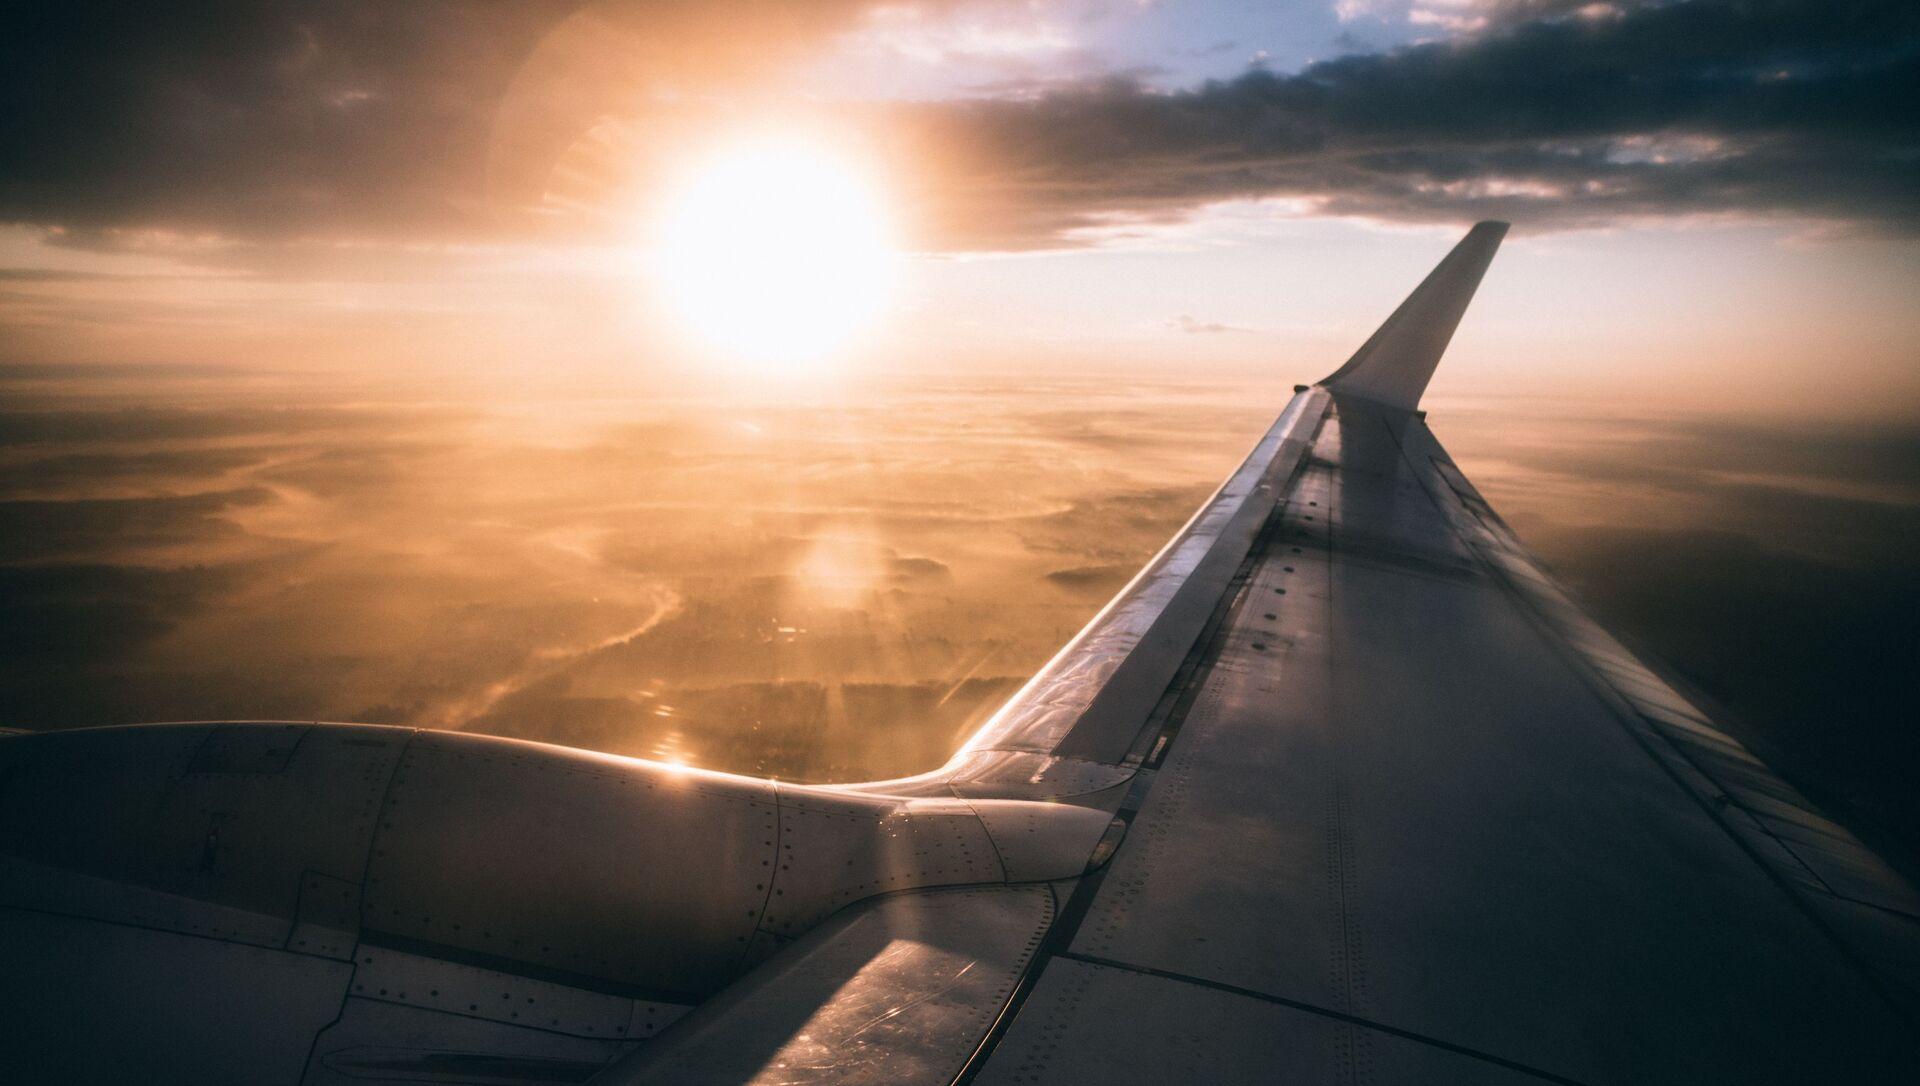 Самолет в небе, фото из архива - Sputnik Азербайджан, 1920, 25.05.2021